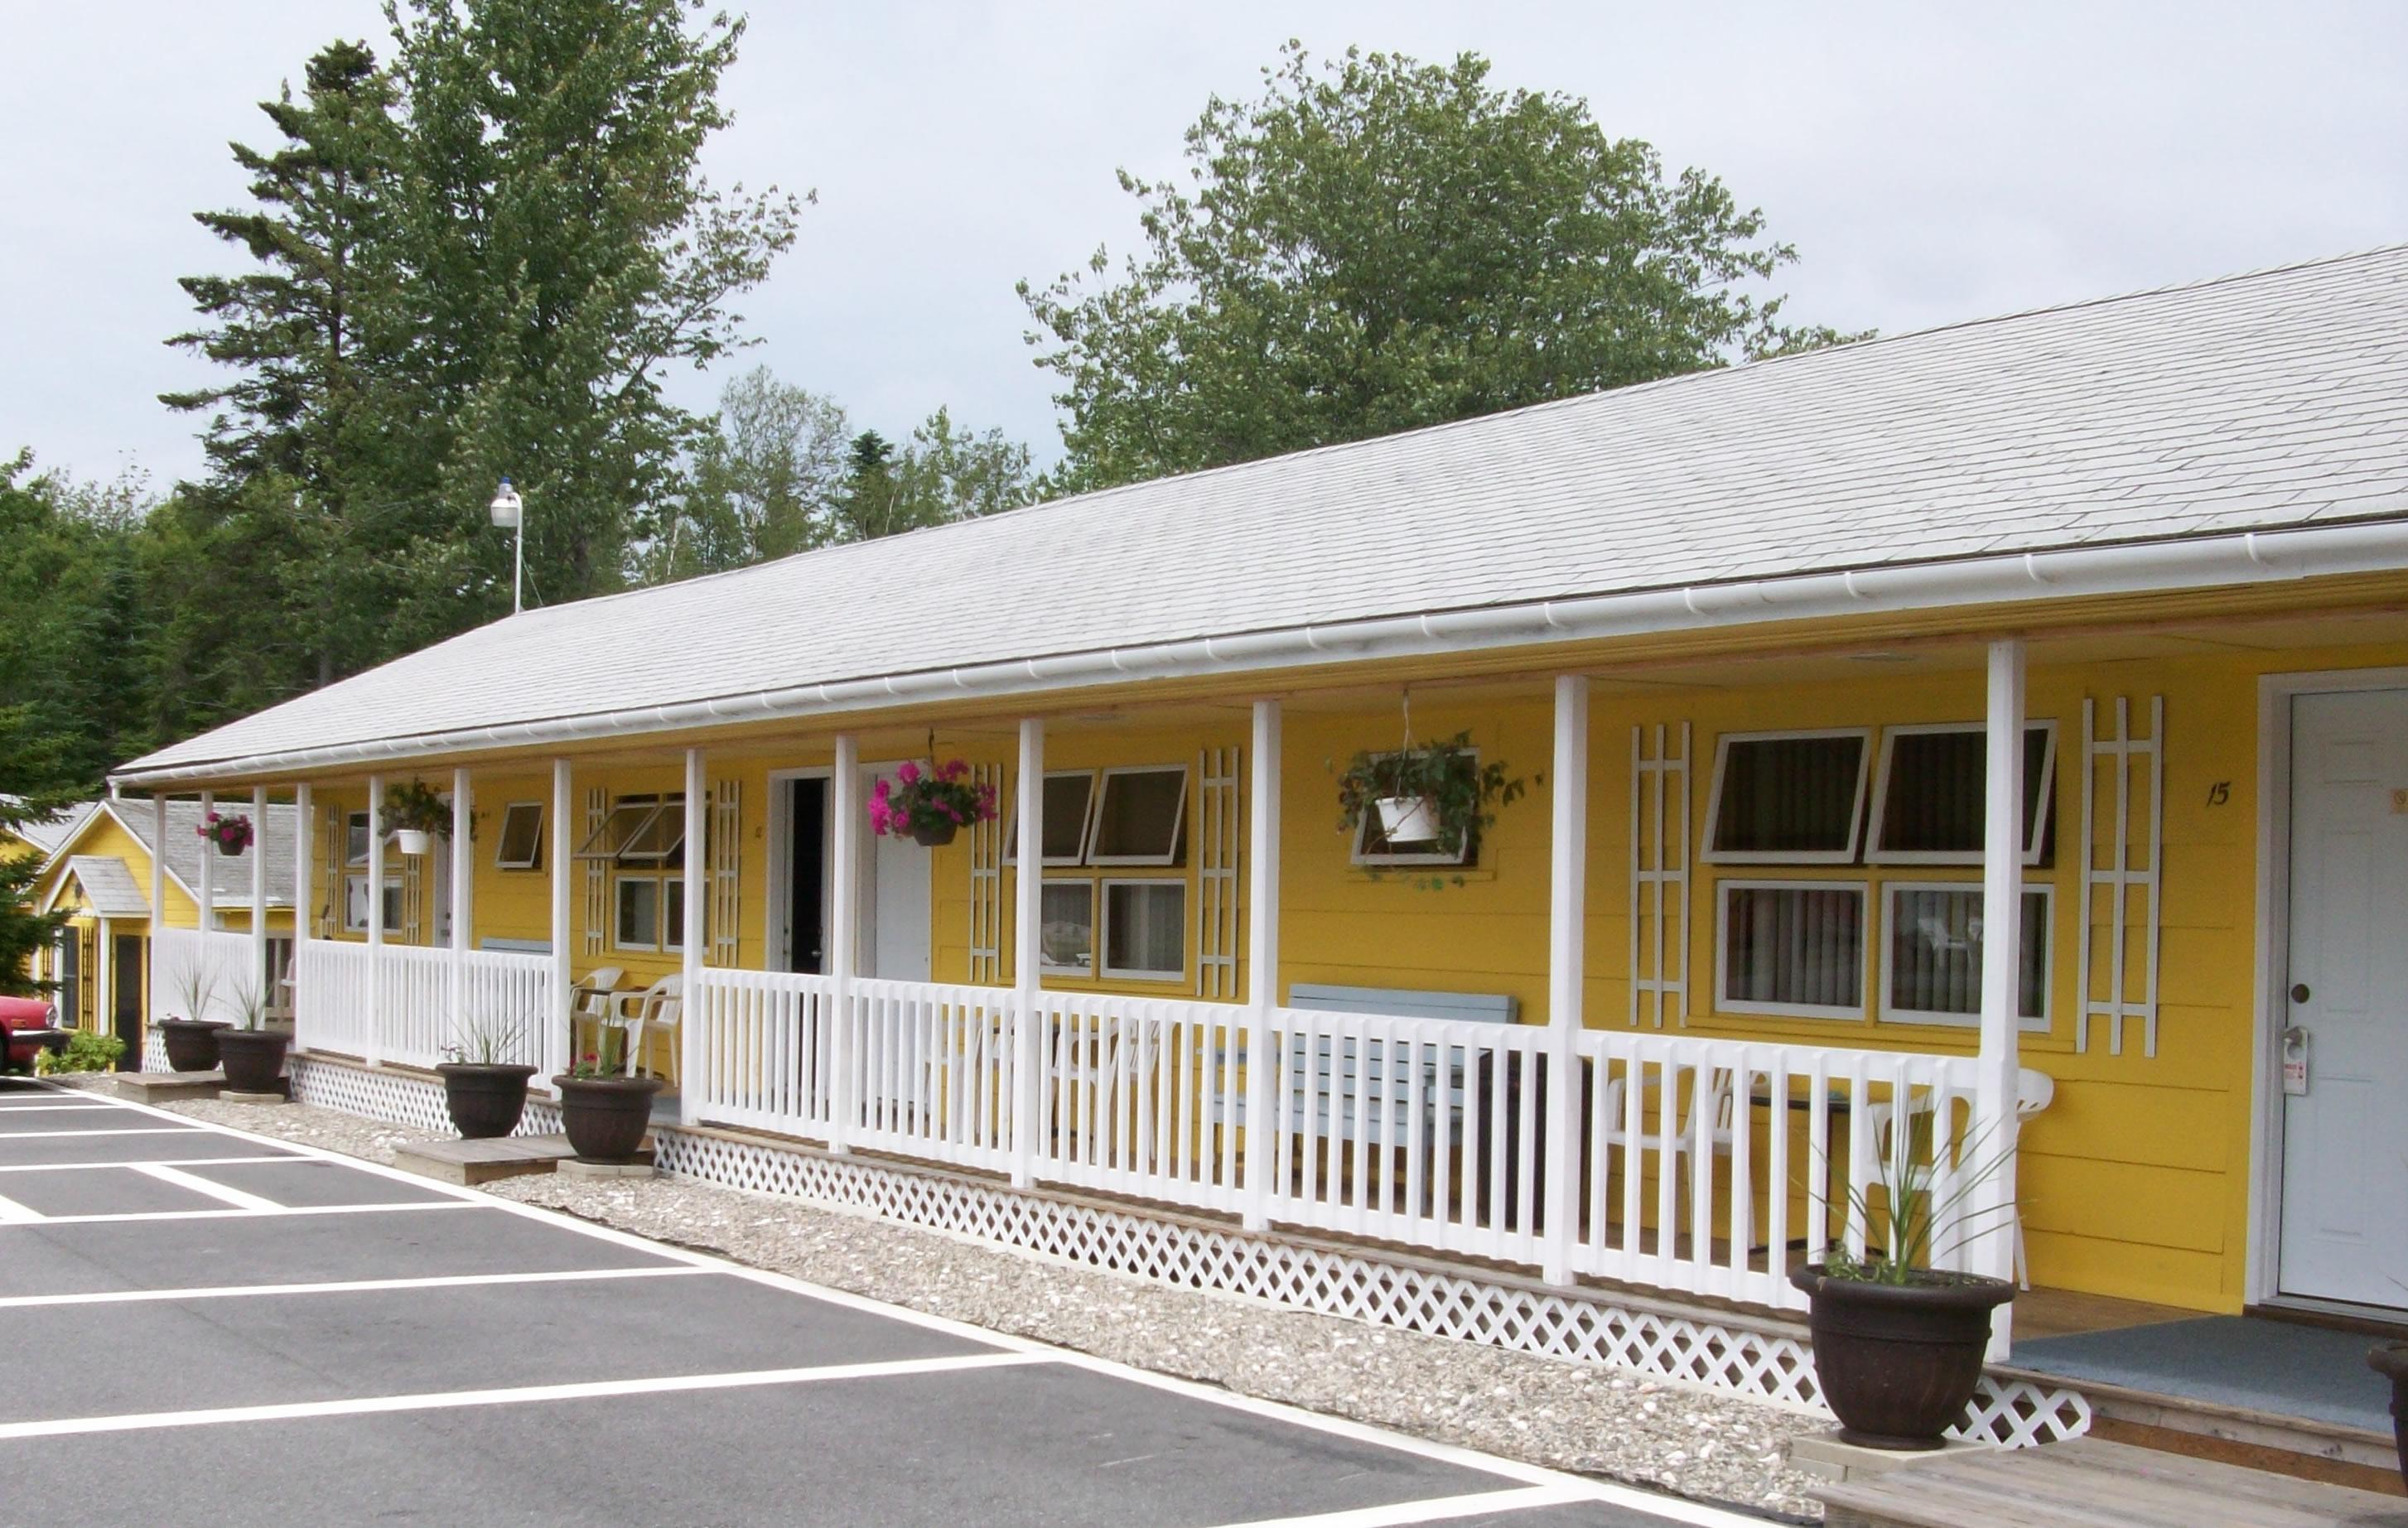 Sunnyside Motel & Cottages